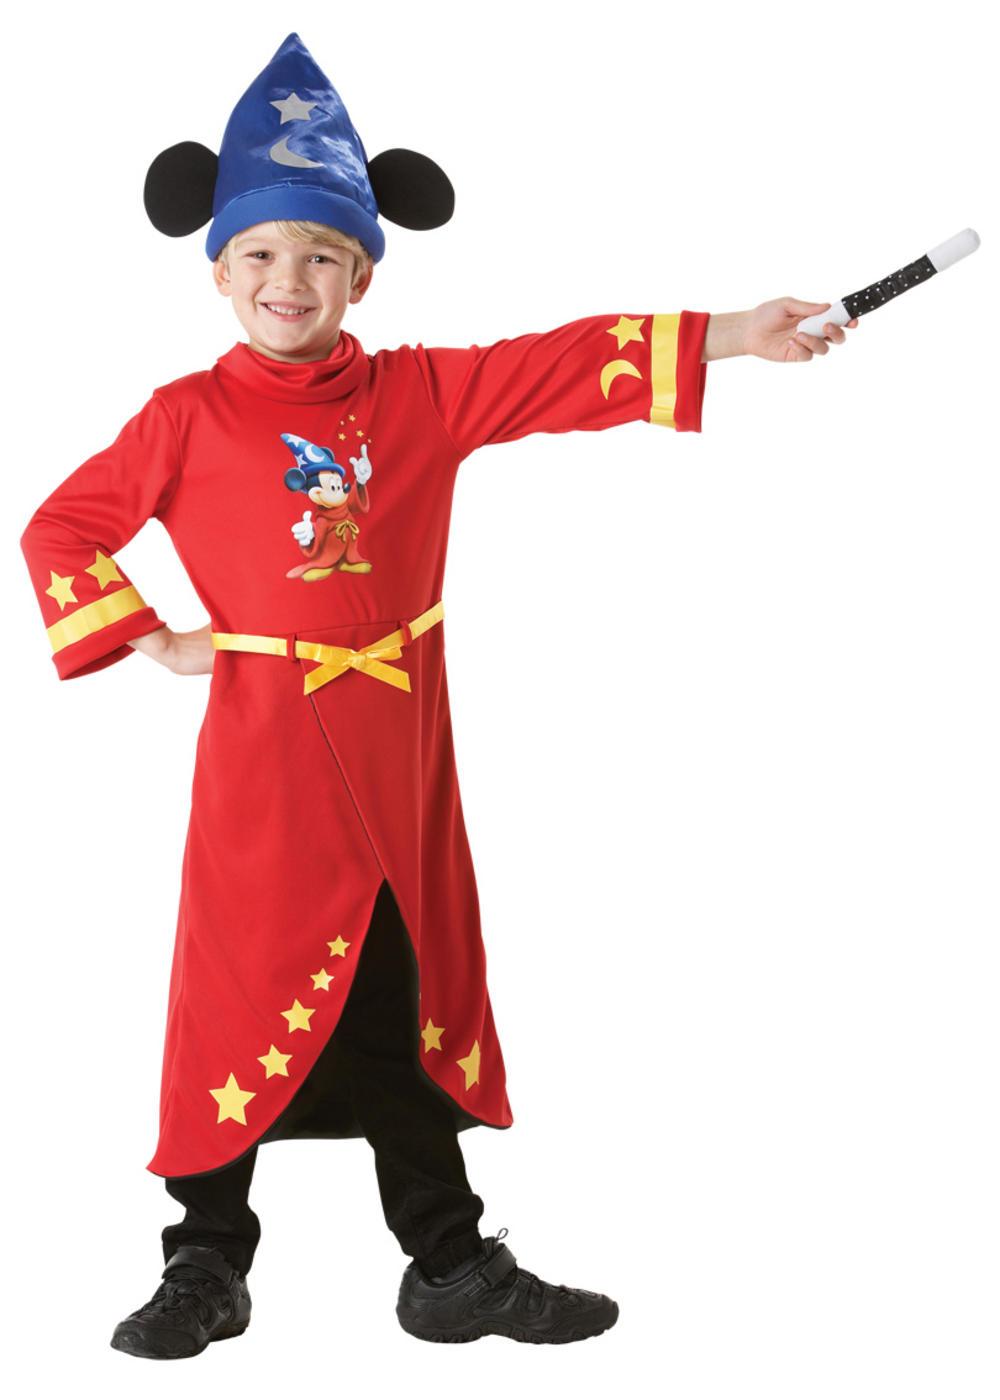 Kidu0027s Disney Mickey Mouse Fantasia Costume  sc 1 st  Mega Fancy Dress & Kidu0027s Disney Mickey Mouse Fantasia Costume   Boyu0027s World Book Day ...